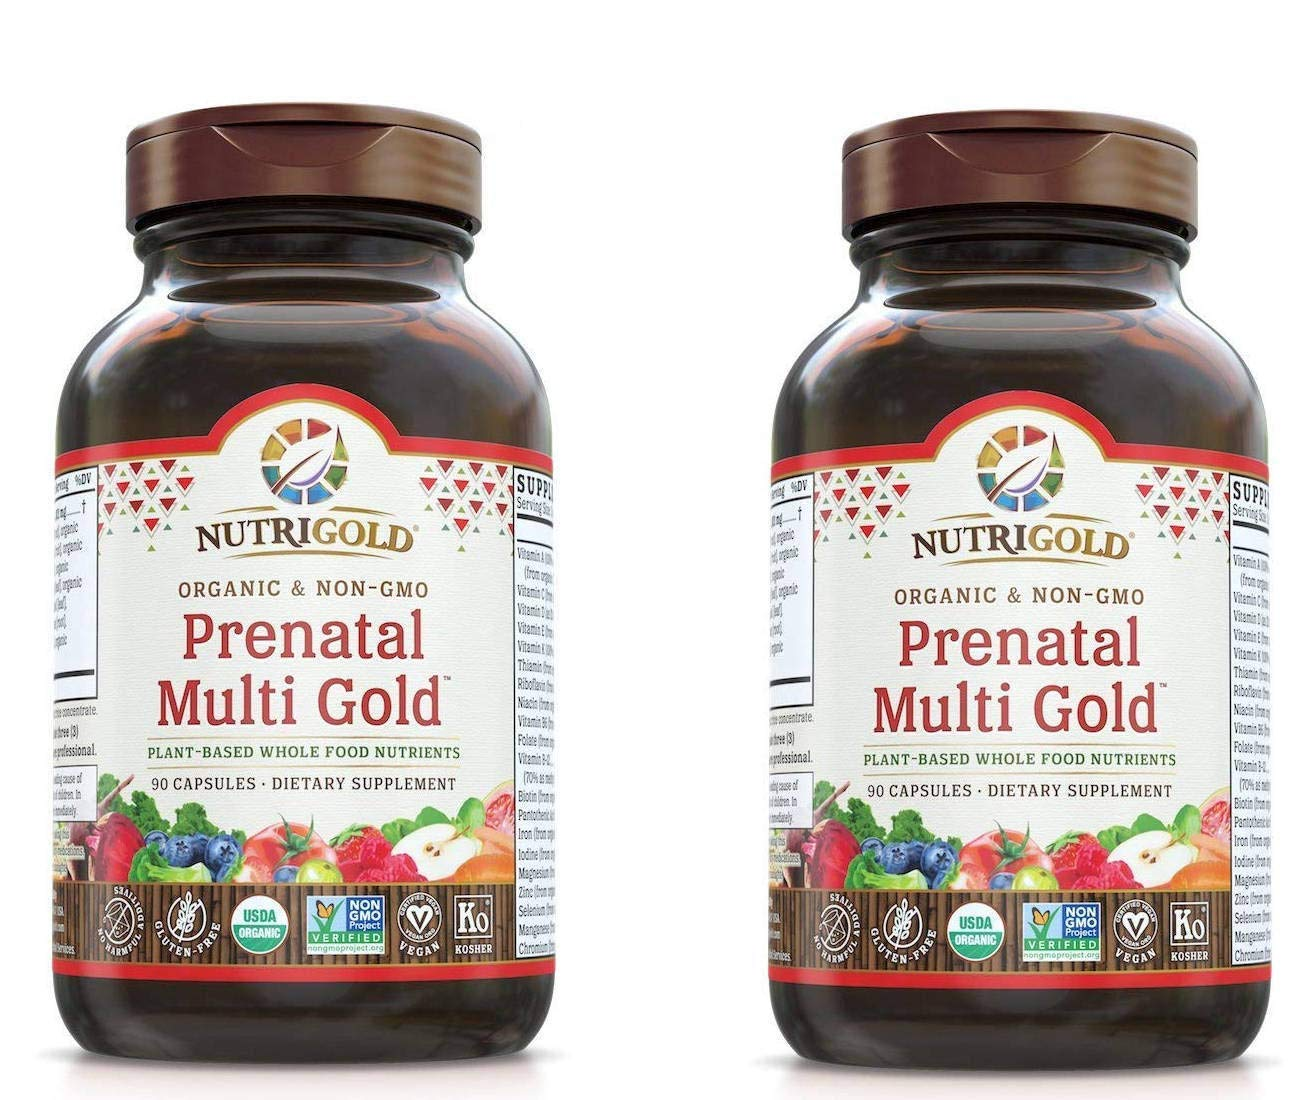 Nutrigold Prenatal Multi Gold Plant-Based Whole Food Nutrients (90 Vegan Capsules) Pack of 2 by NUTRIG0LD (Image #1)